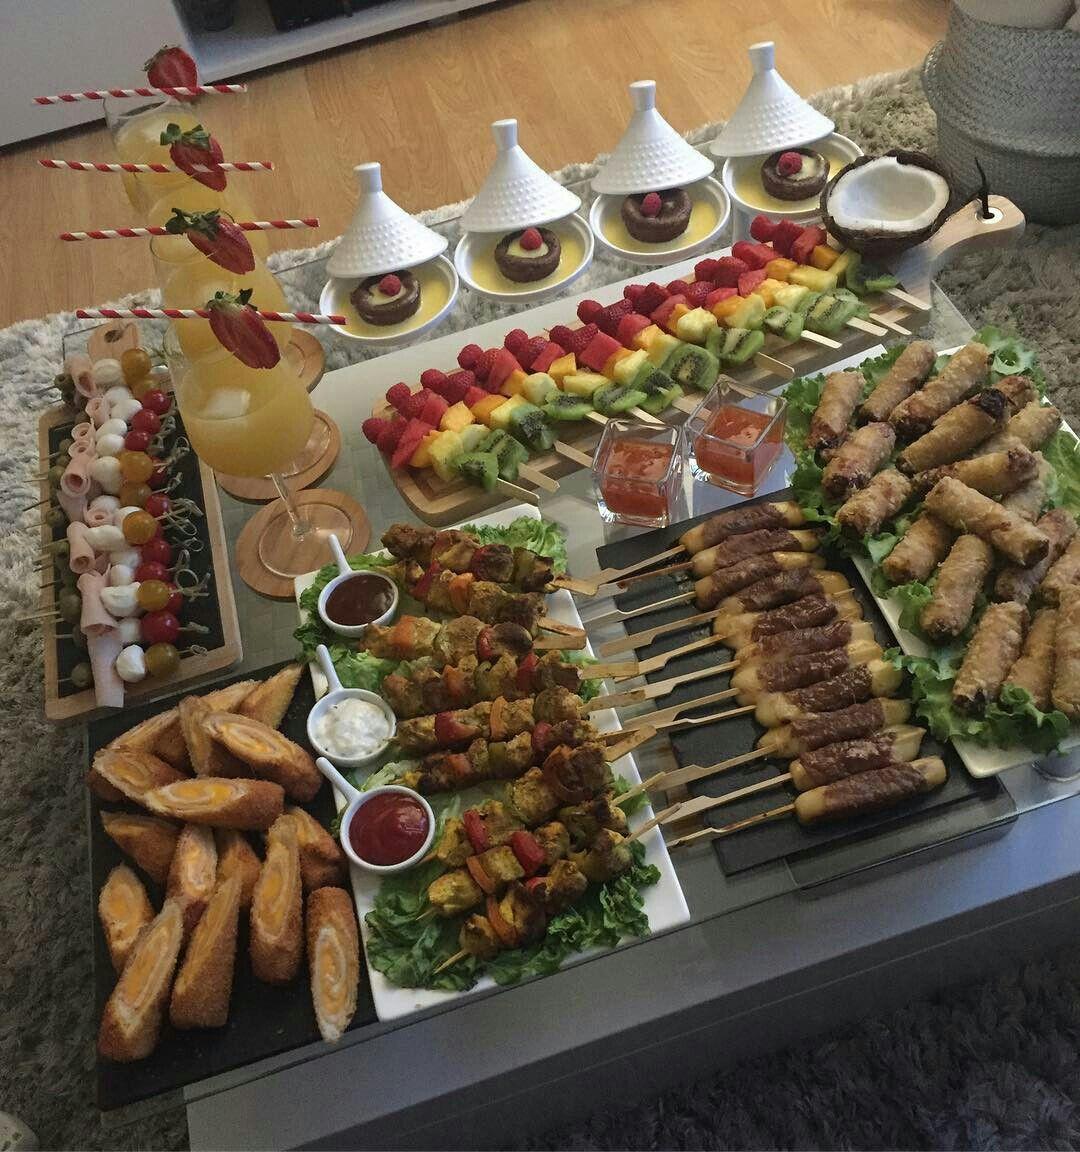 Idée Repas Marocain Épinglé par Asmaa El sur ramadan | Recettes de cuisine, Cuisine